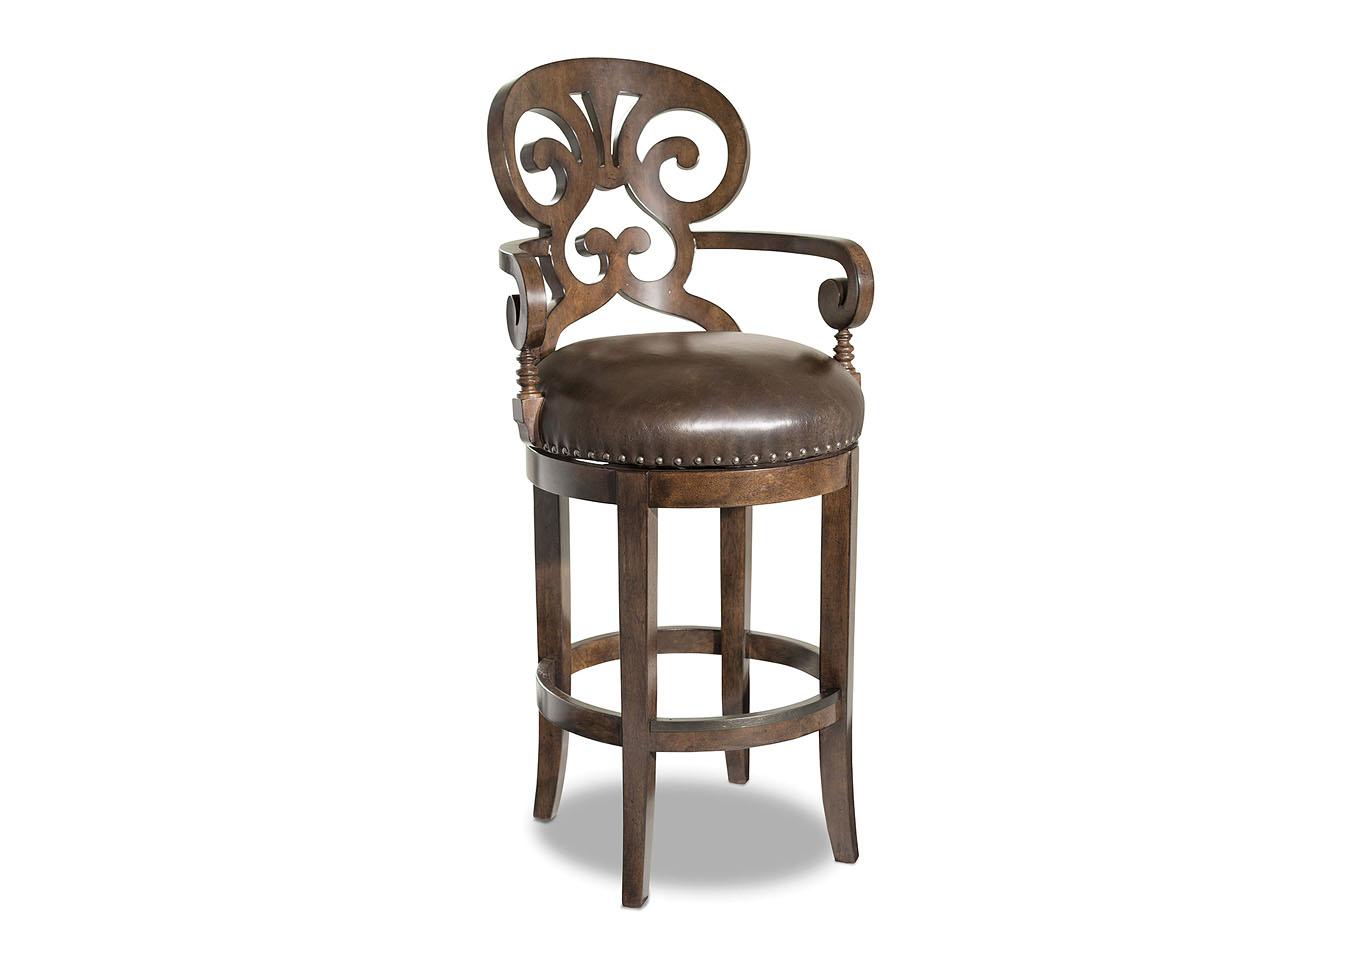 Jameson Cottage Leather Barstool,Hooker Furniture